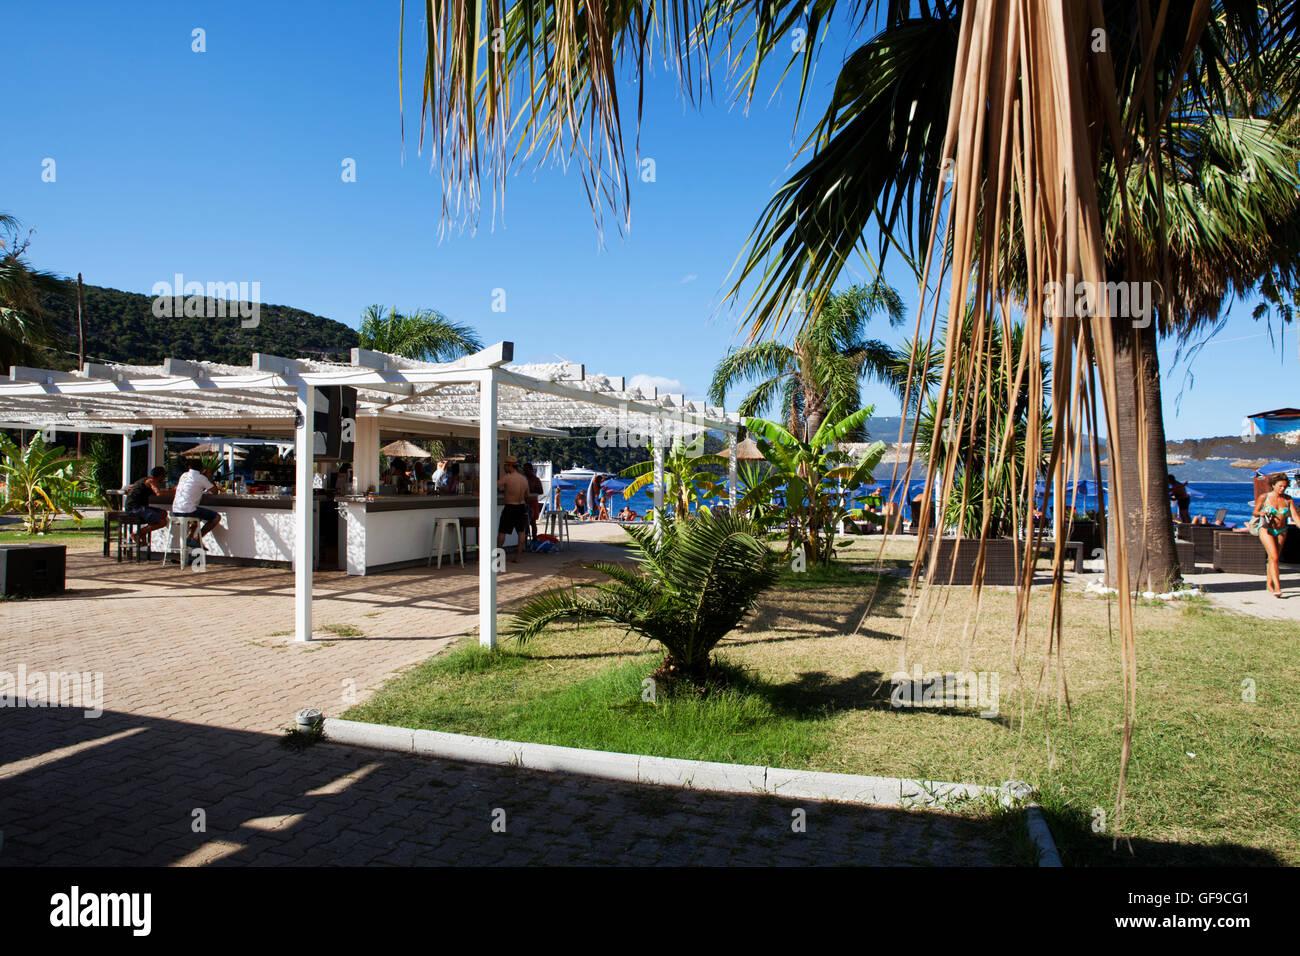 Beach bar at Kefalonia beach Antisamos, Ionian Islands, Greece - Stock Image